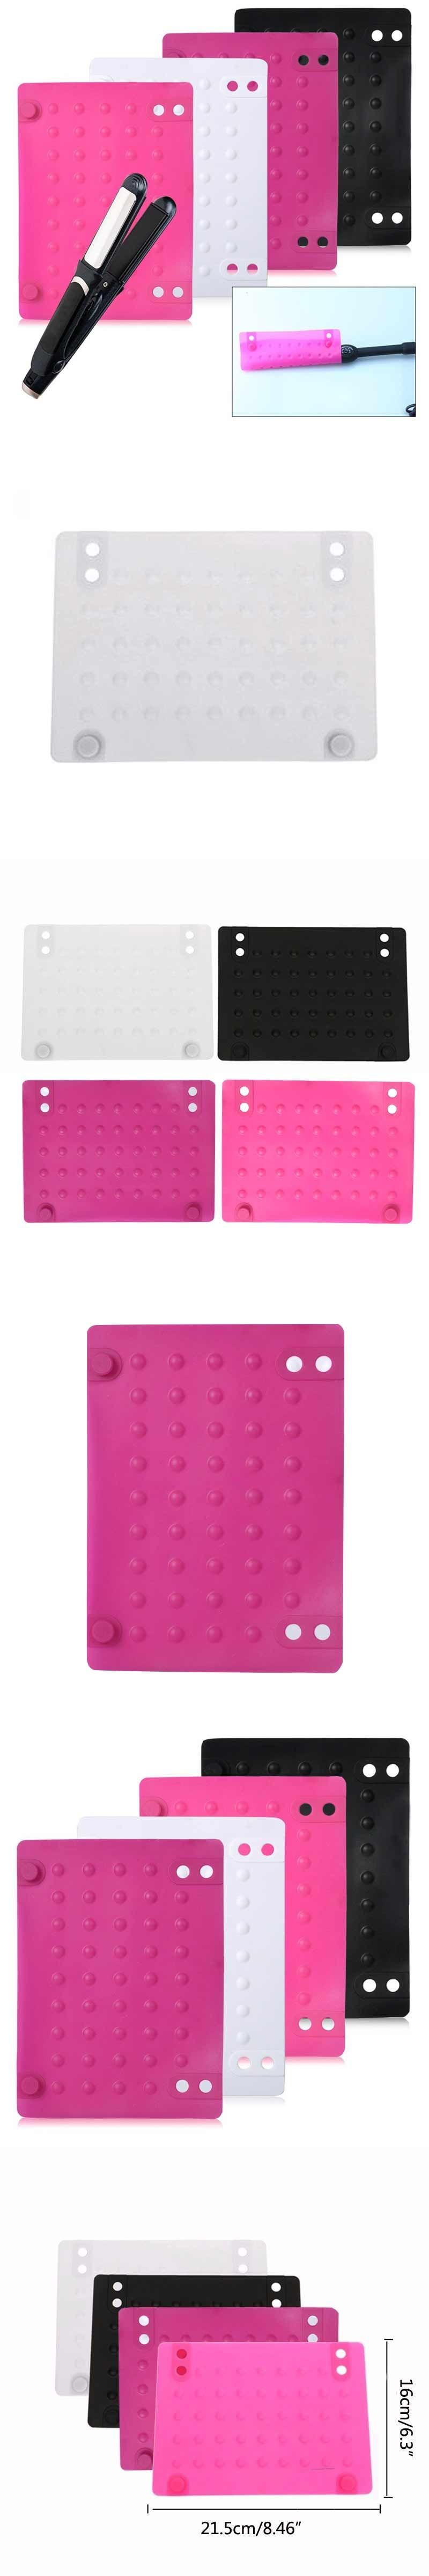 pyumzetardvq fancy resistant mat silicone mats plate heat productimage china photos table